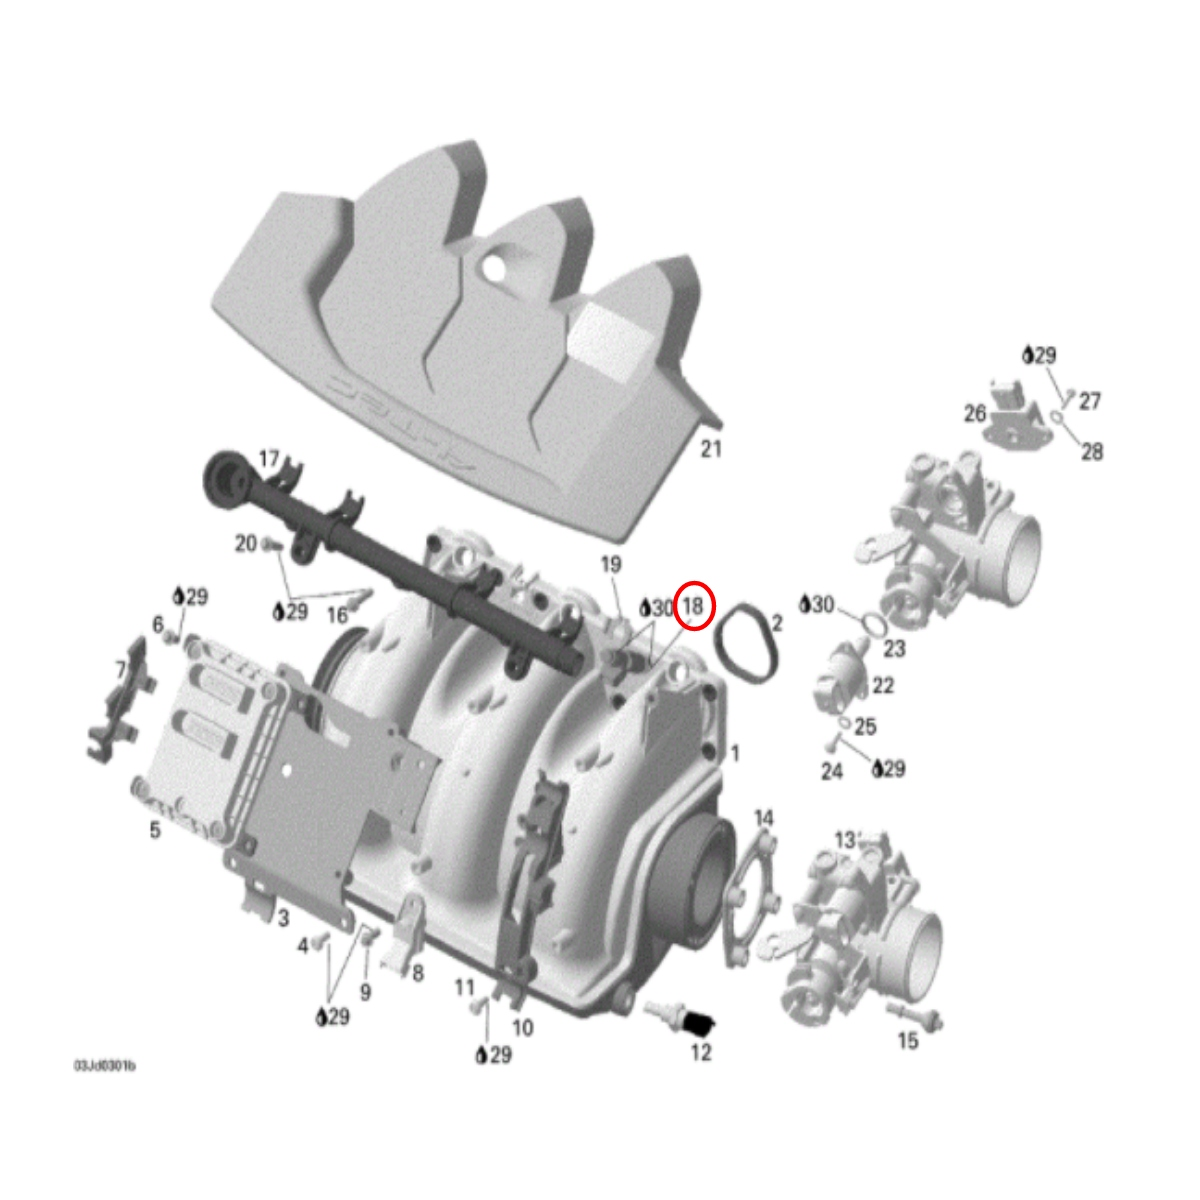 Bico Injetor para Jet Ski Sea Doo GTI/GTX 4 TEC Importado  - Radical Peças - Peças para Jet Ski